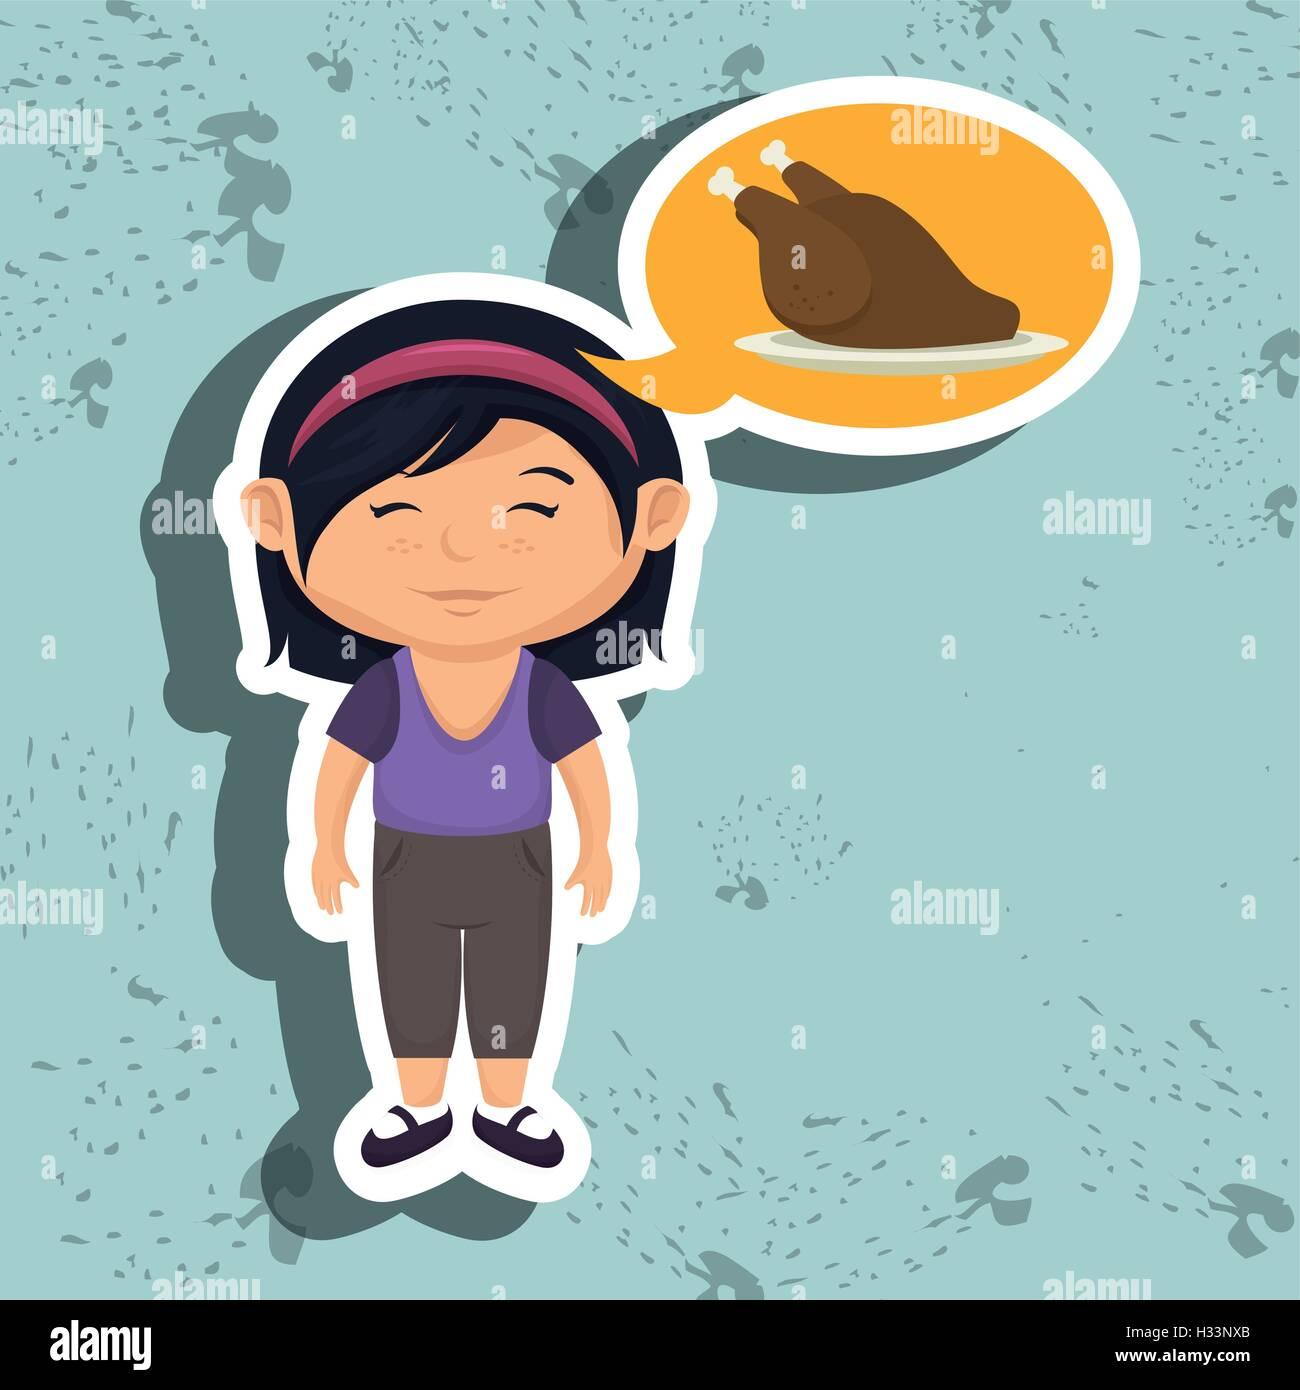 Chicken Food Cartoon